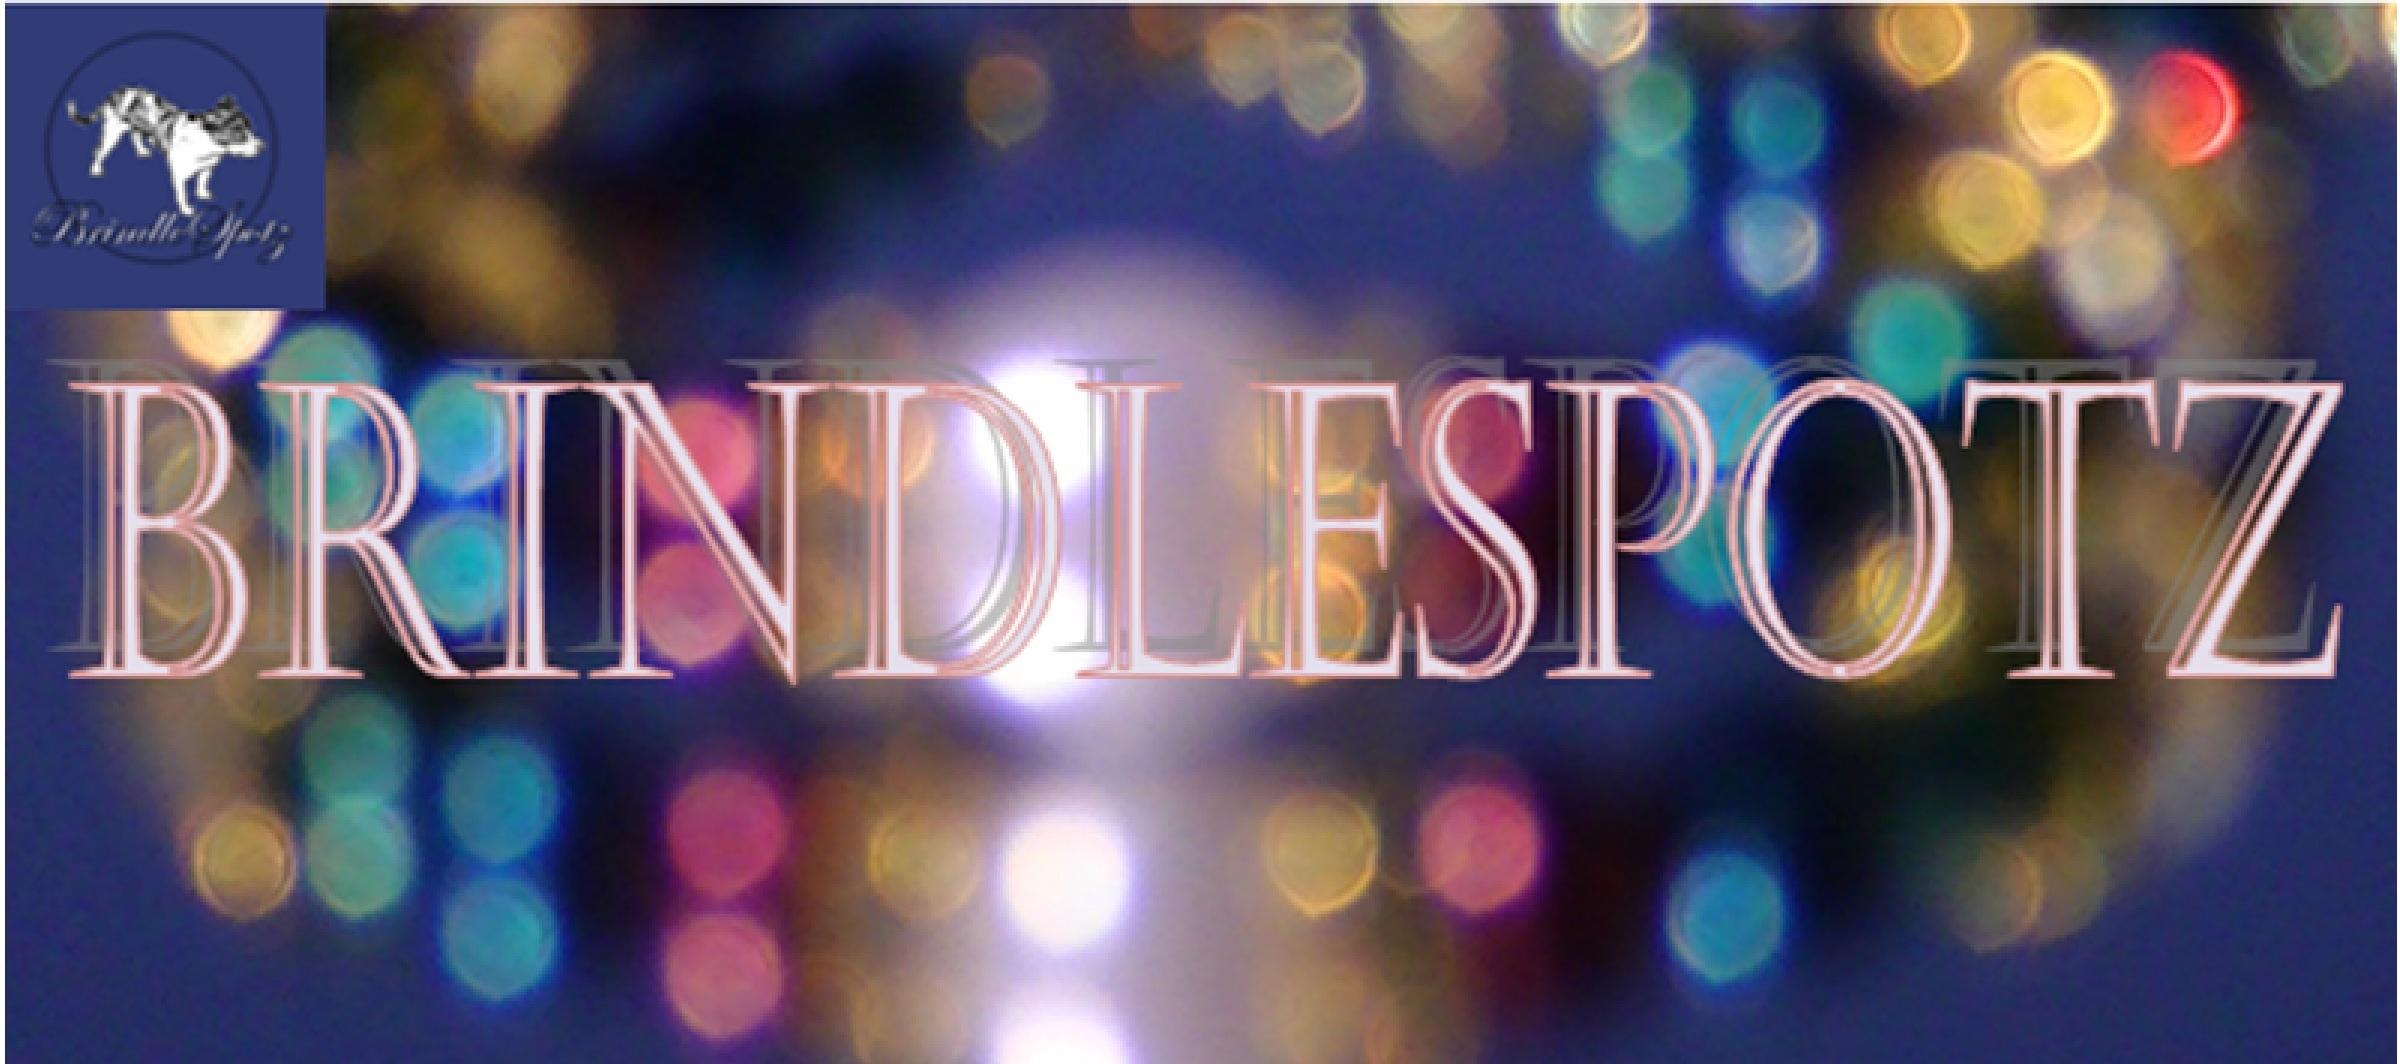 BrindleSpotz (@brindlespotz) Cover Image